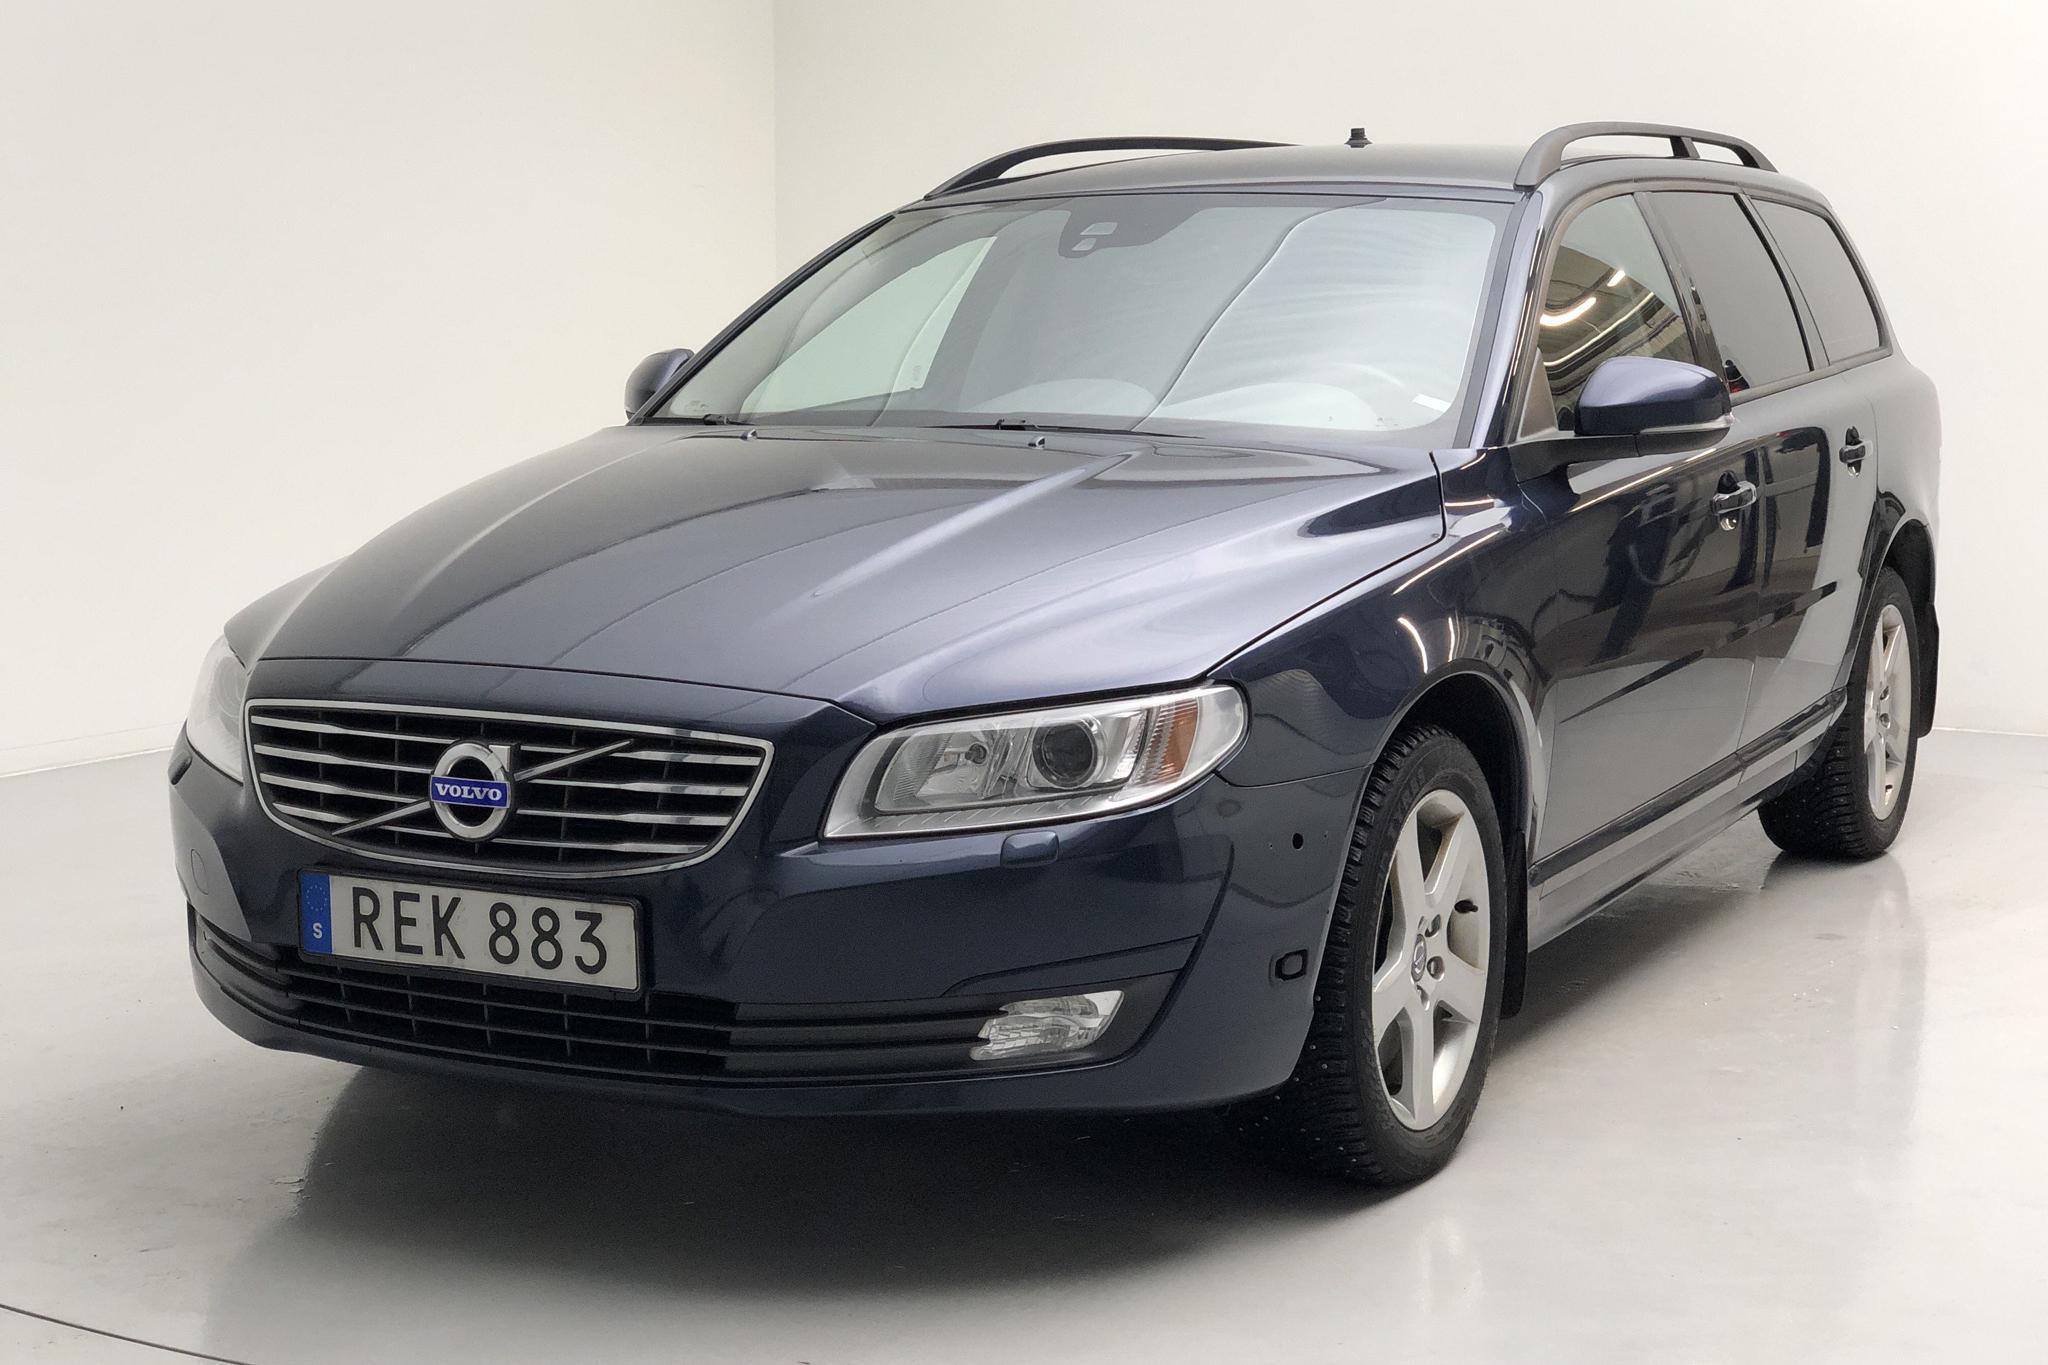 Volvo V70 II T4F (180hk) - 112 390 km - Automatic - Dark Blue - 2015